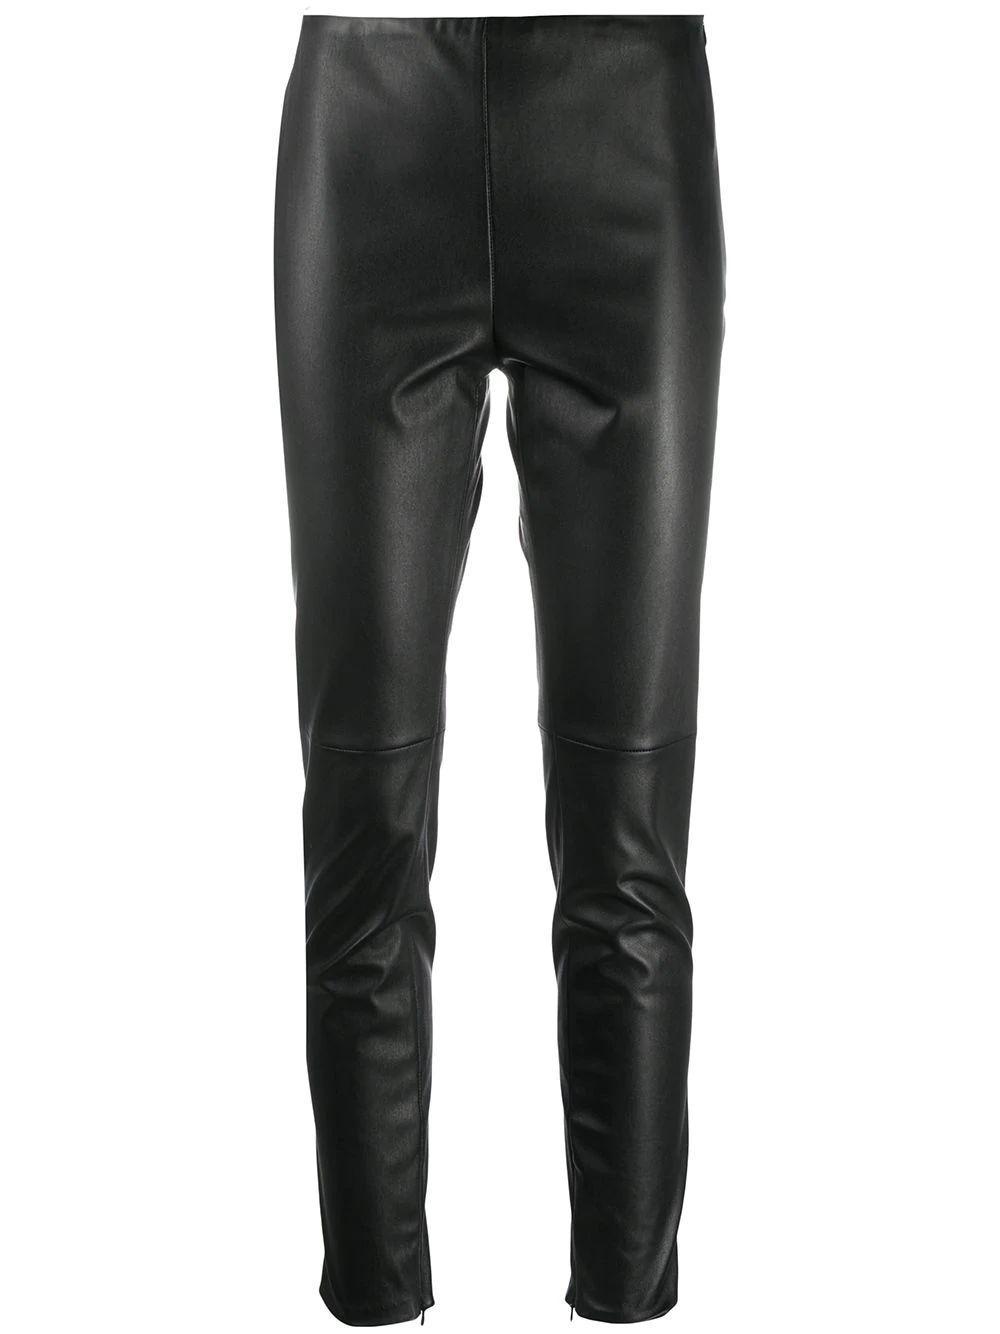 Eleanora Stretch Leather Legging